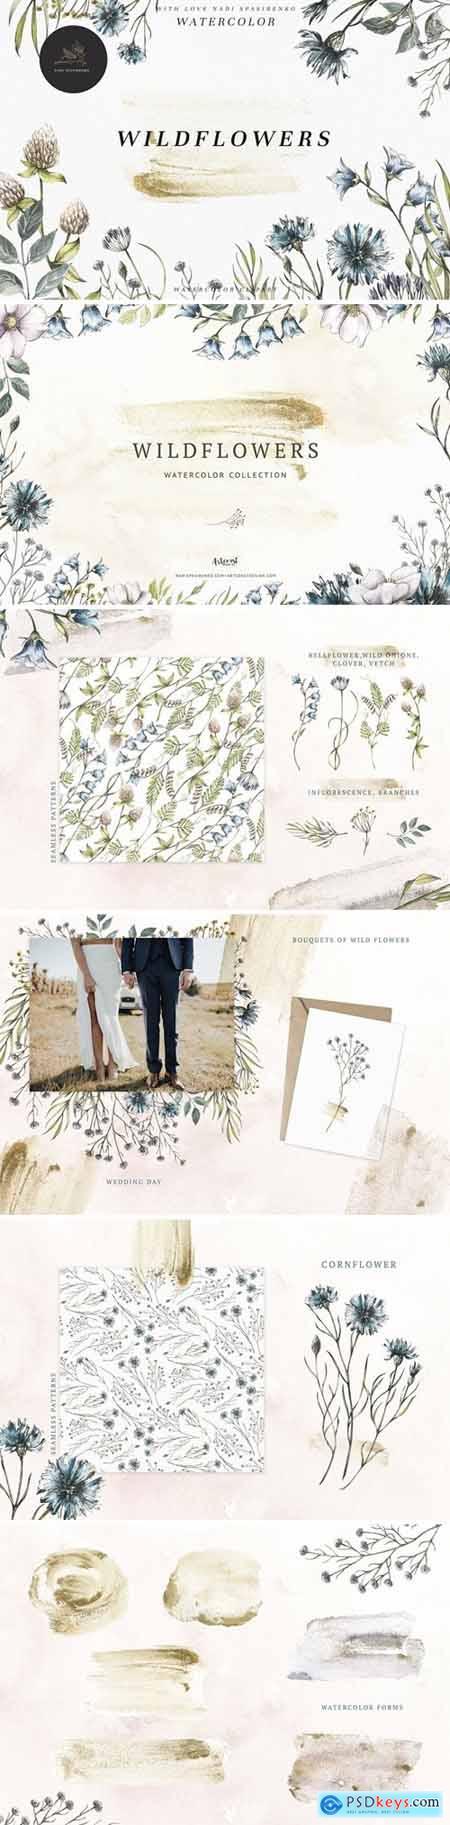 Watercolor Botanical Wildflowers